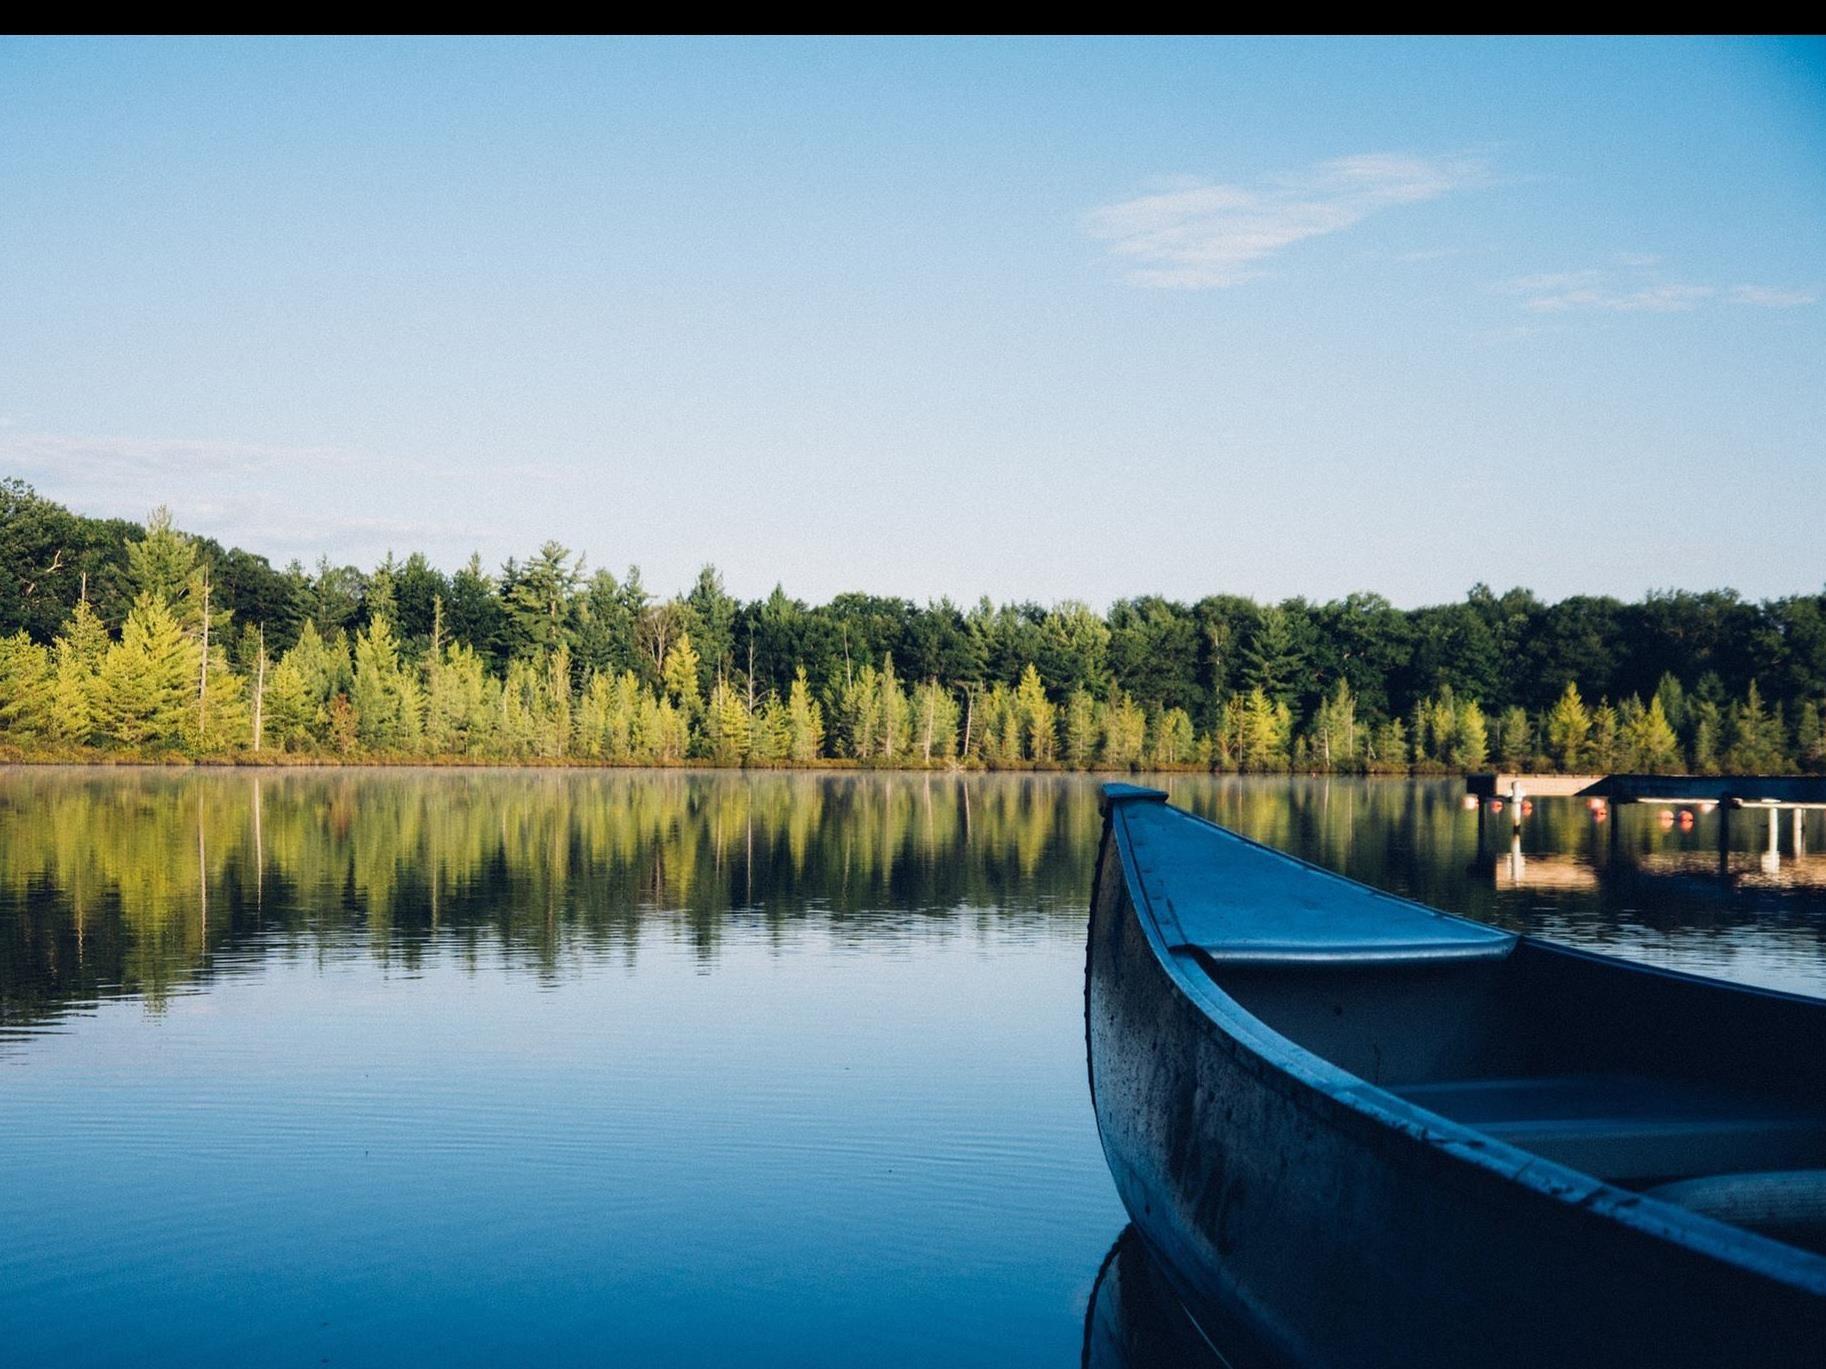 Nordisk vildmarksupplevelse - Kanotuthyrning, Sörsjön